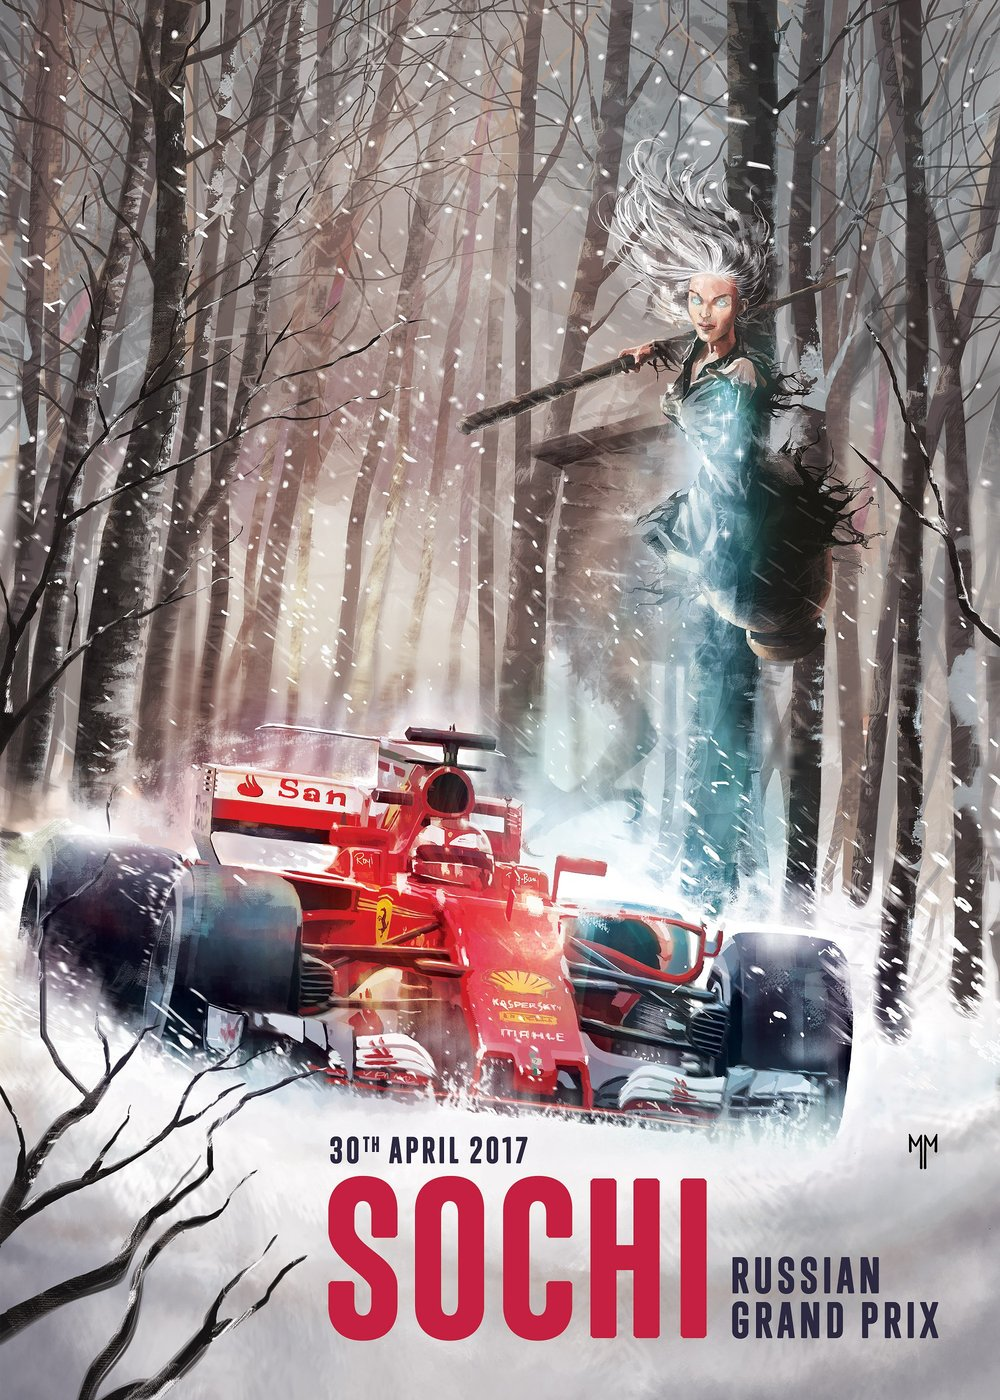 russia-gp-ferrari-poster-2017.jpg